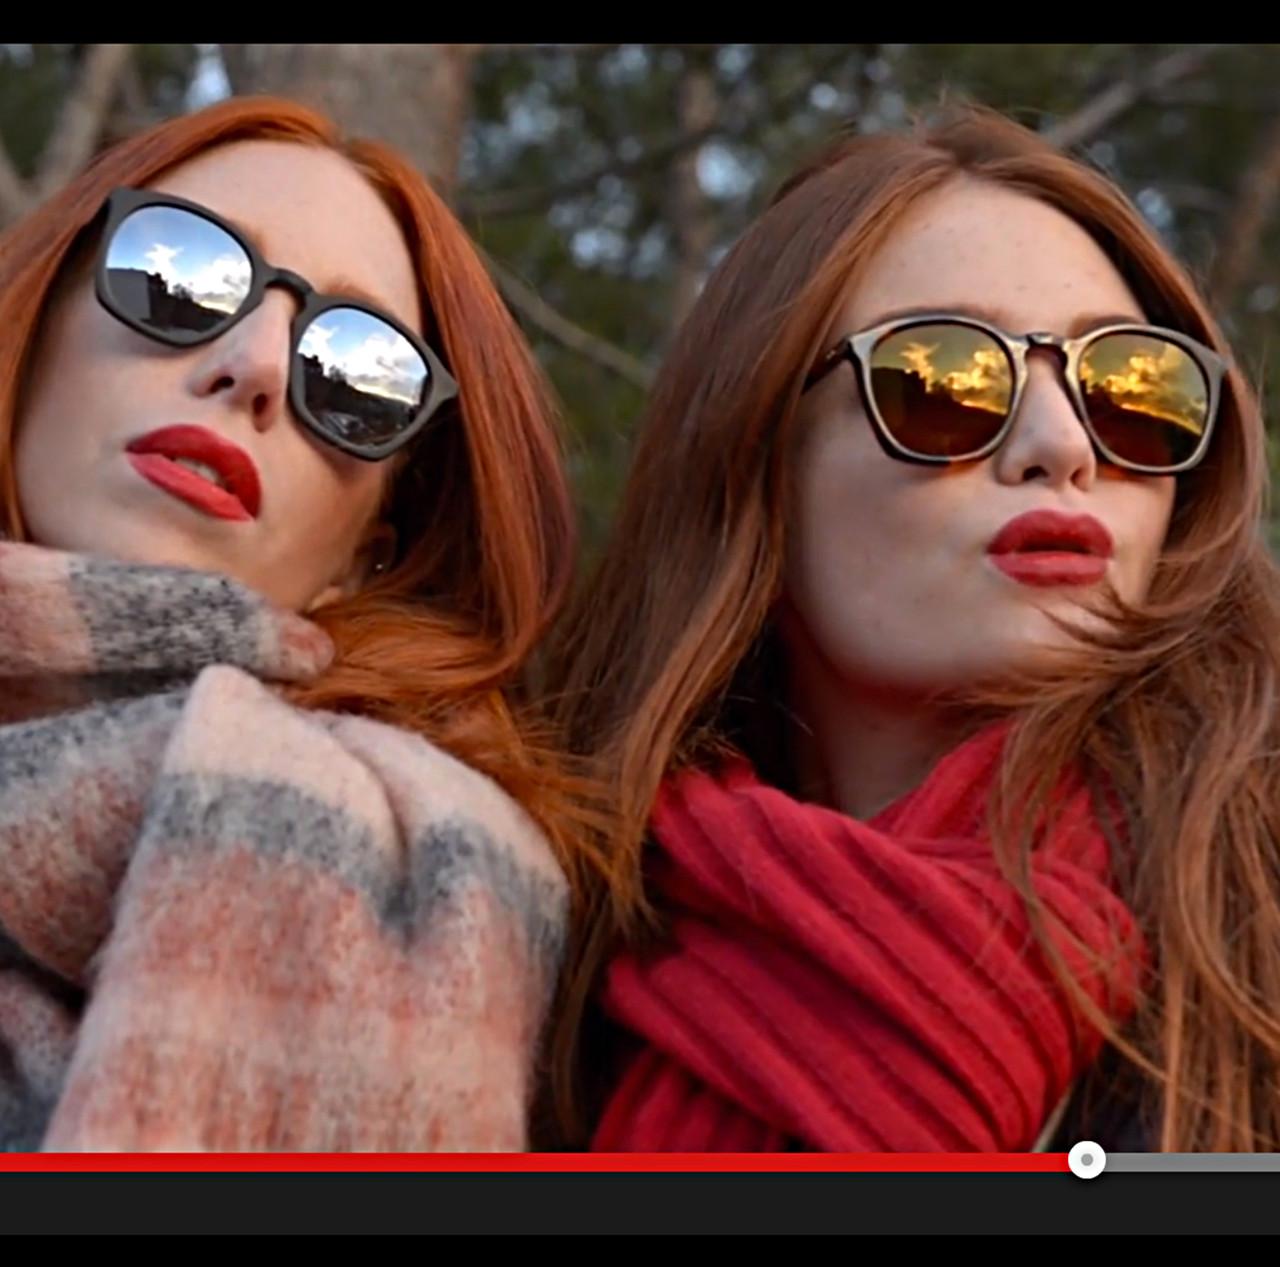 GEEK Eyewear GEEK ROUQ 4.0 Sunglass with Mirror Lenses